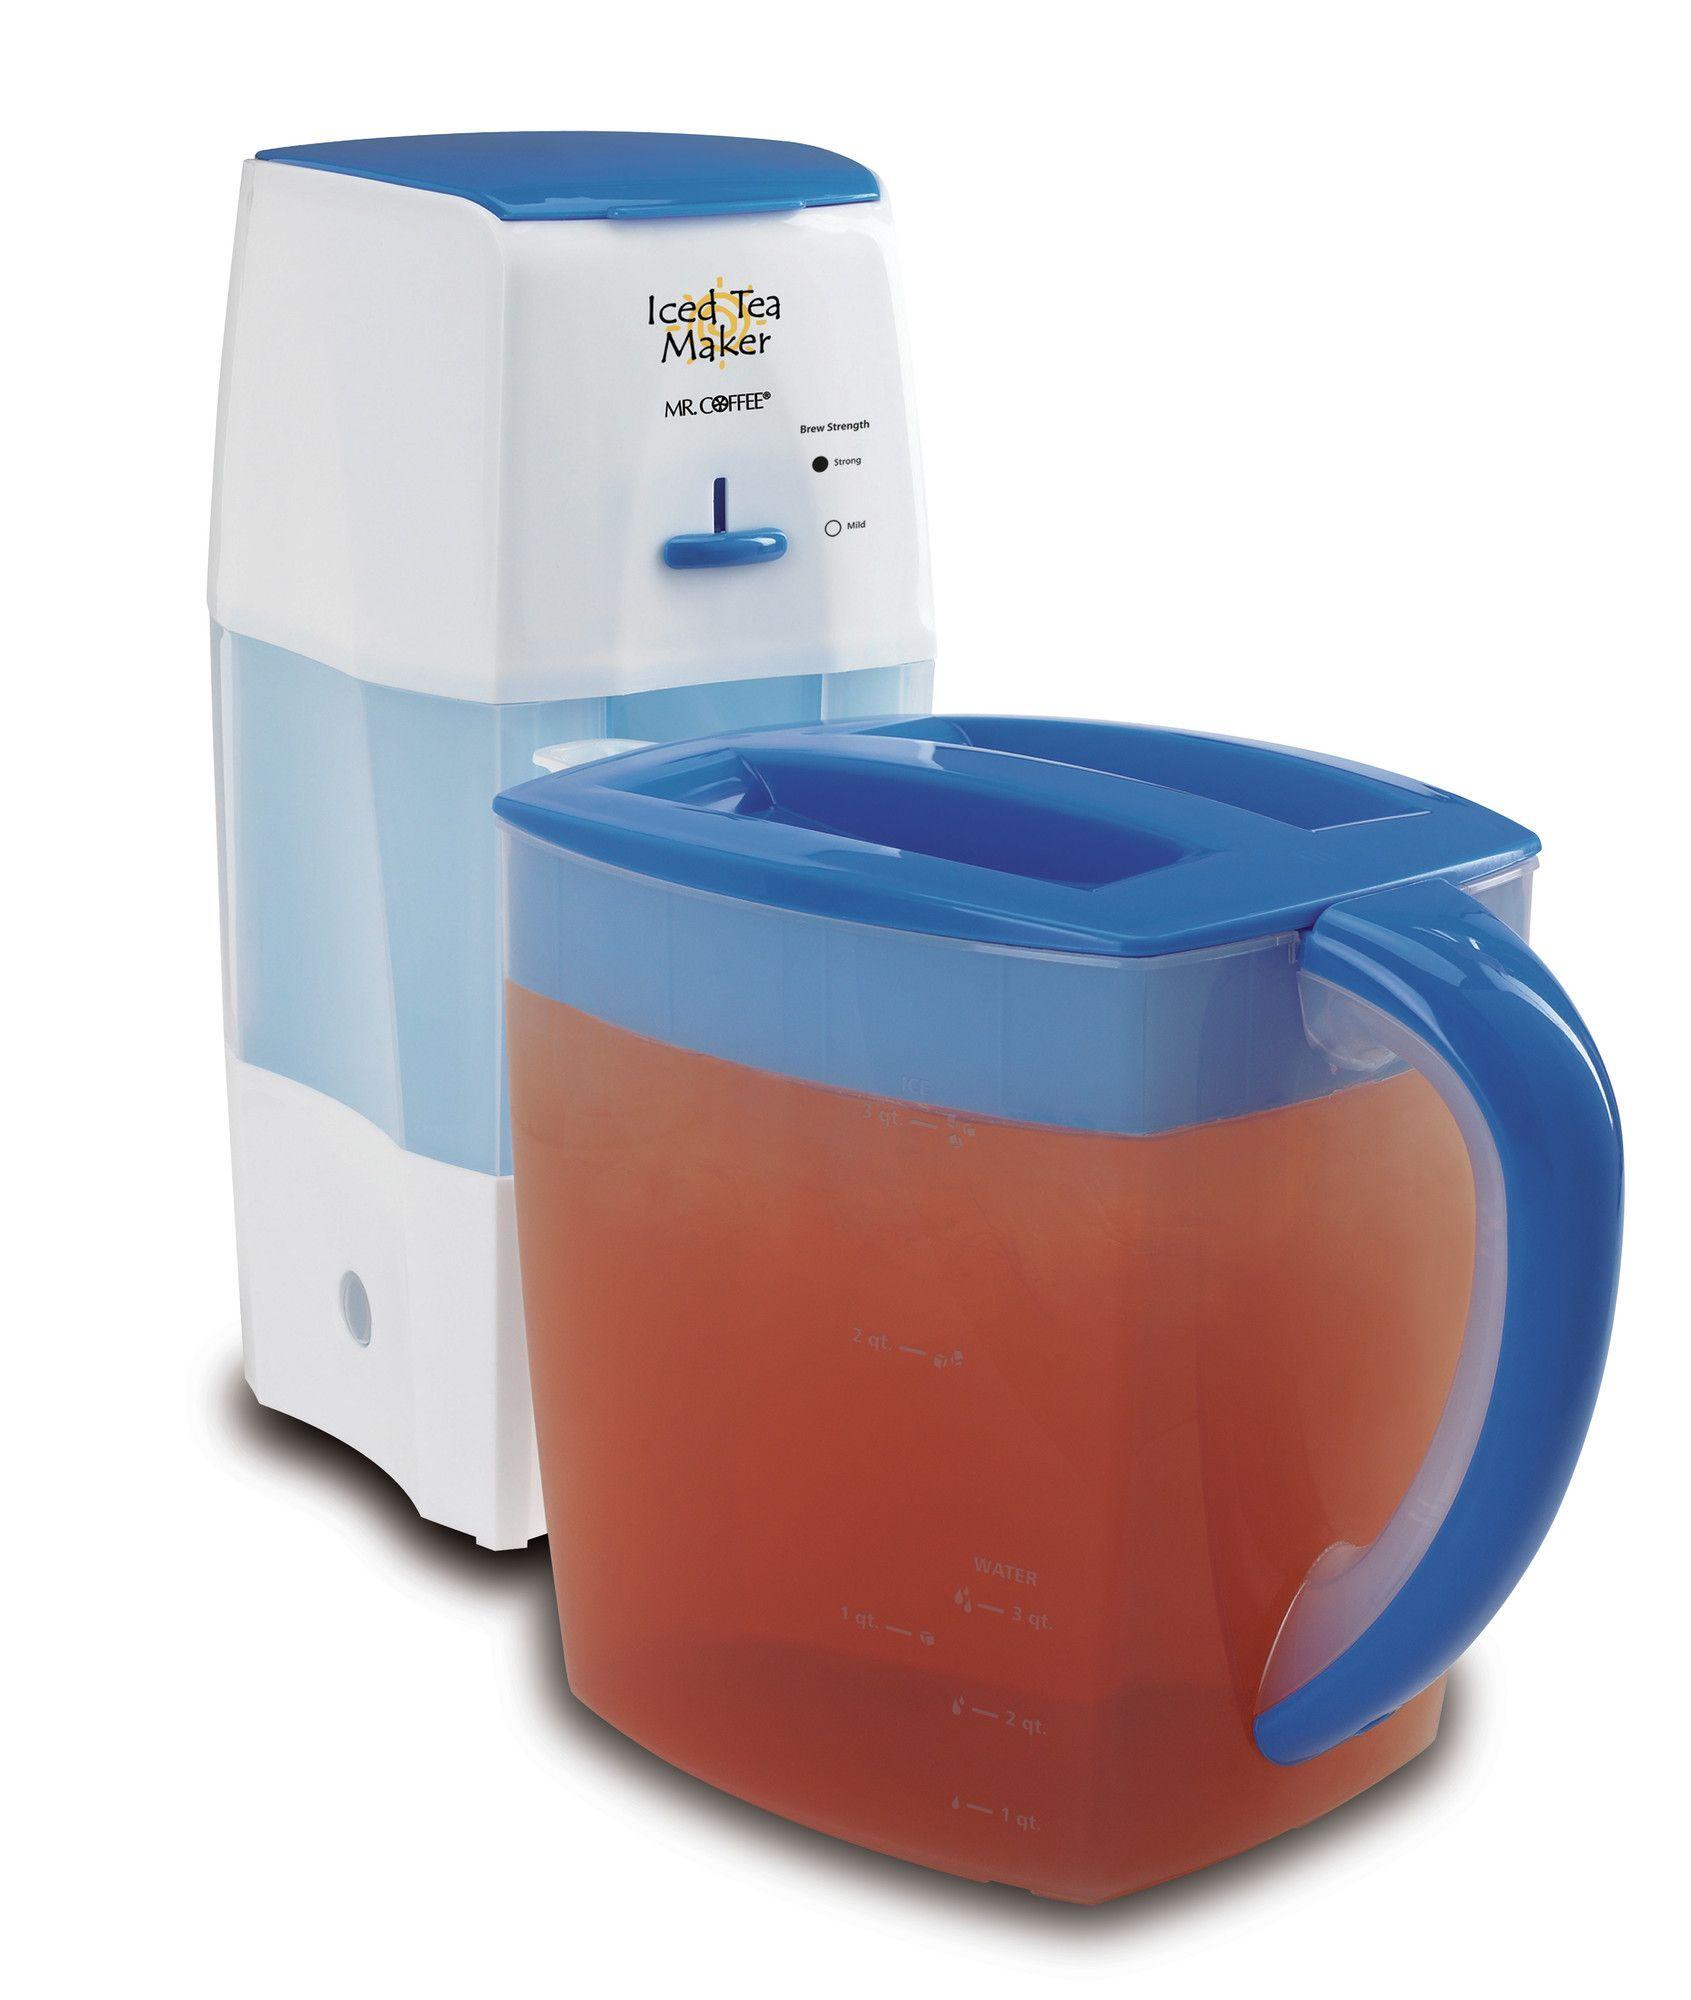 Iced Mocha Coffee Recipe & Mr. Coffee® Brewer /Millstone